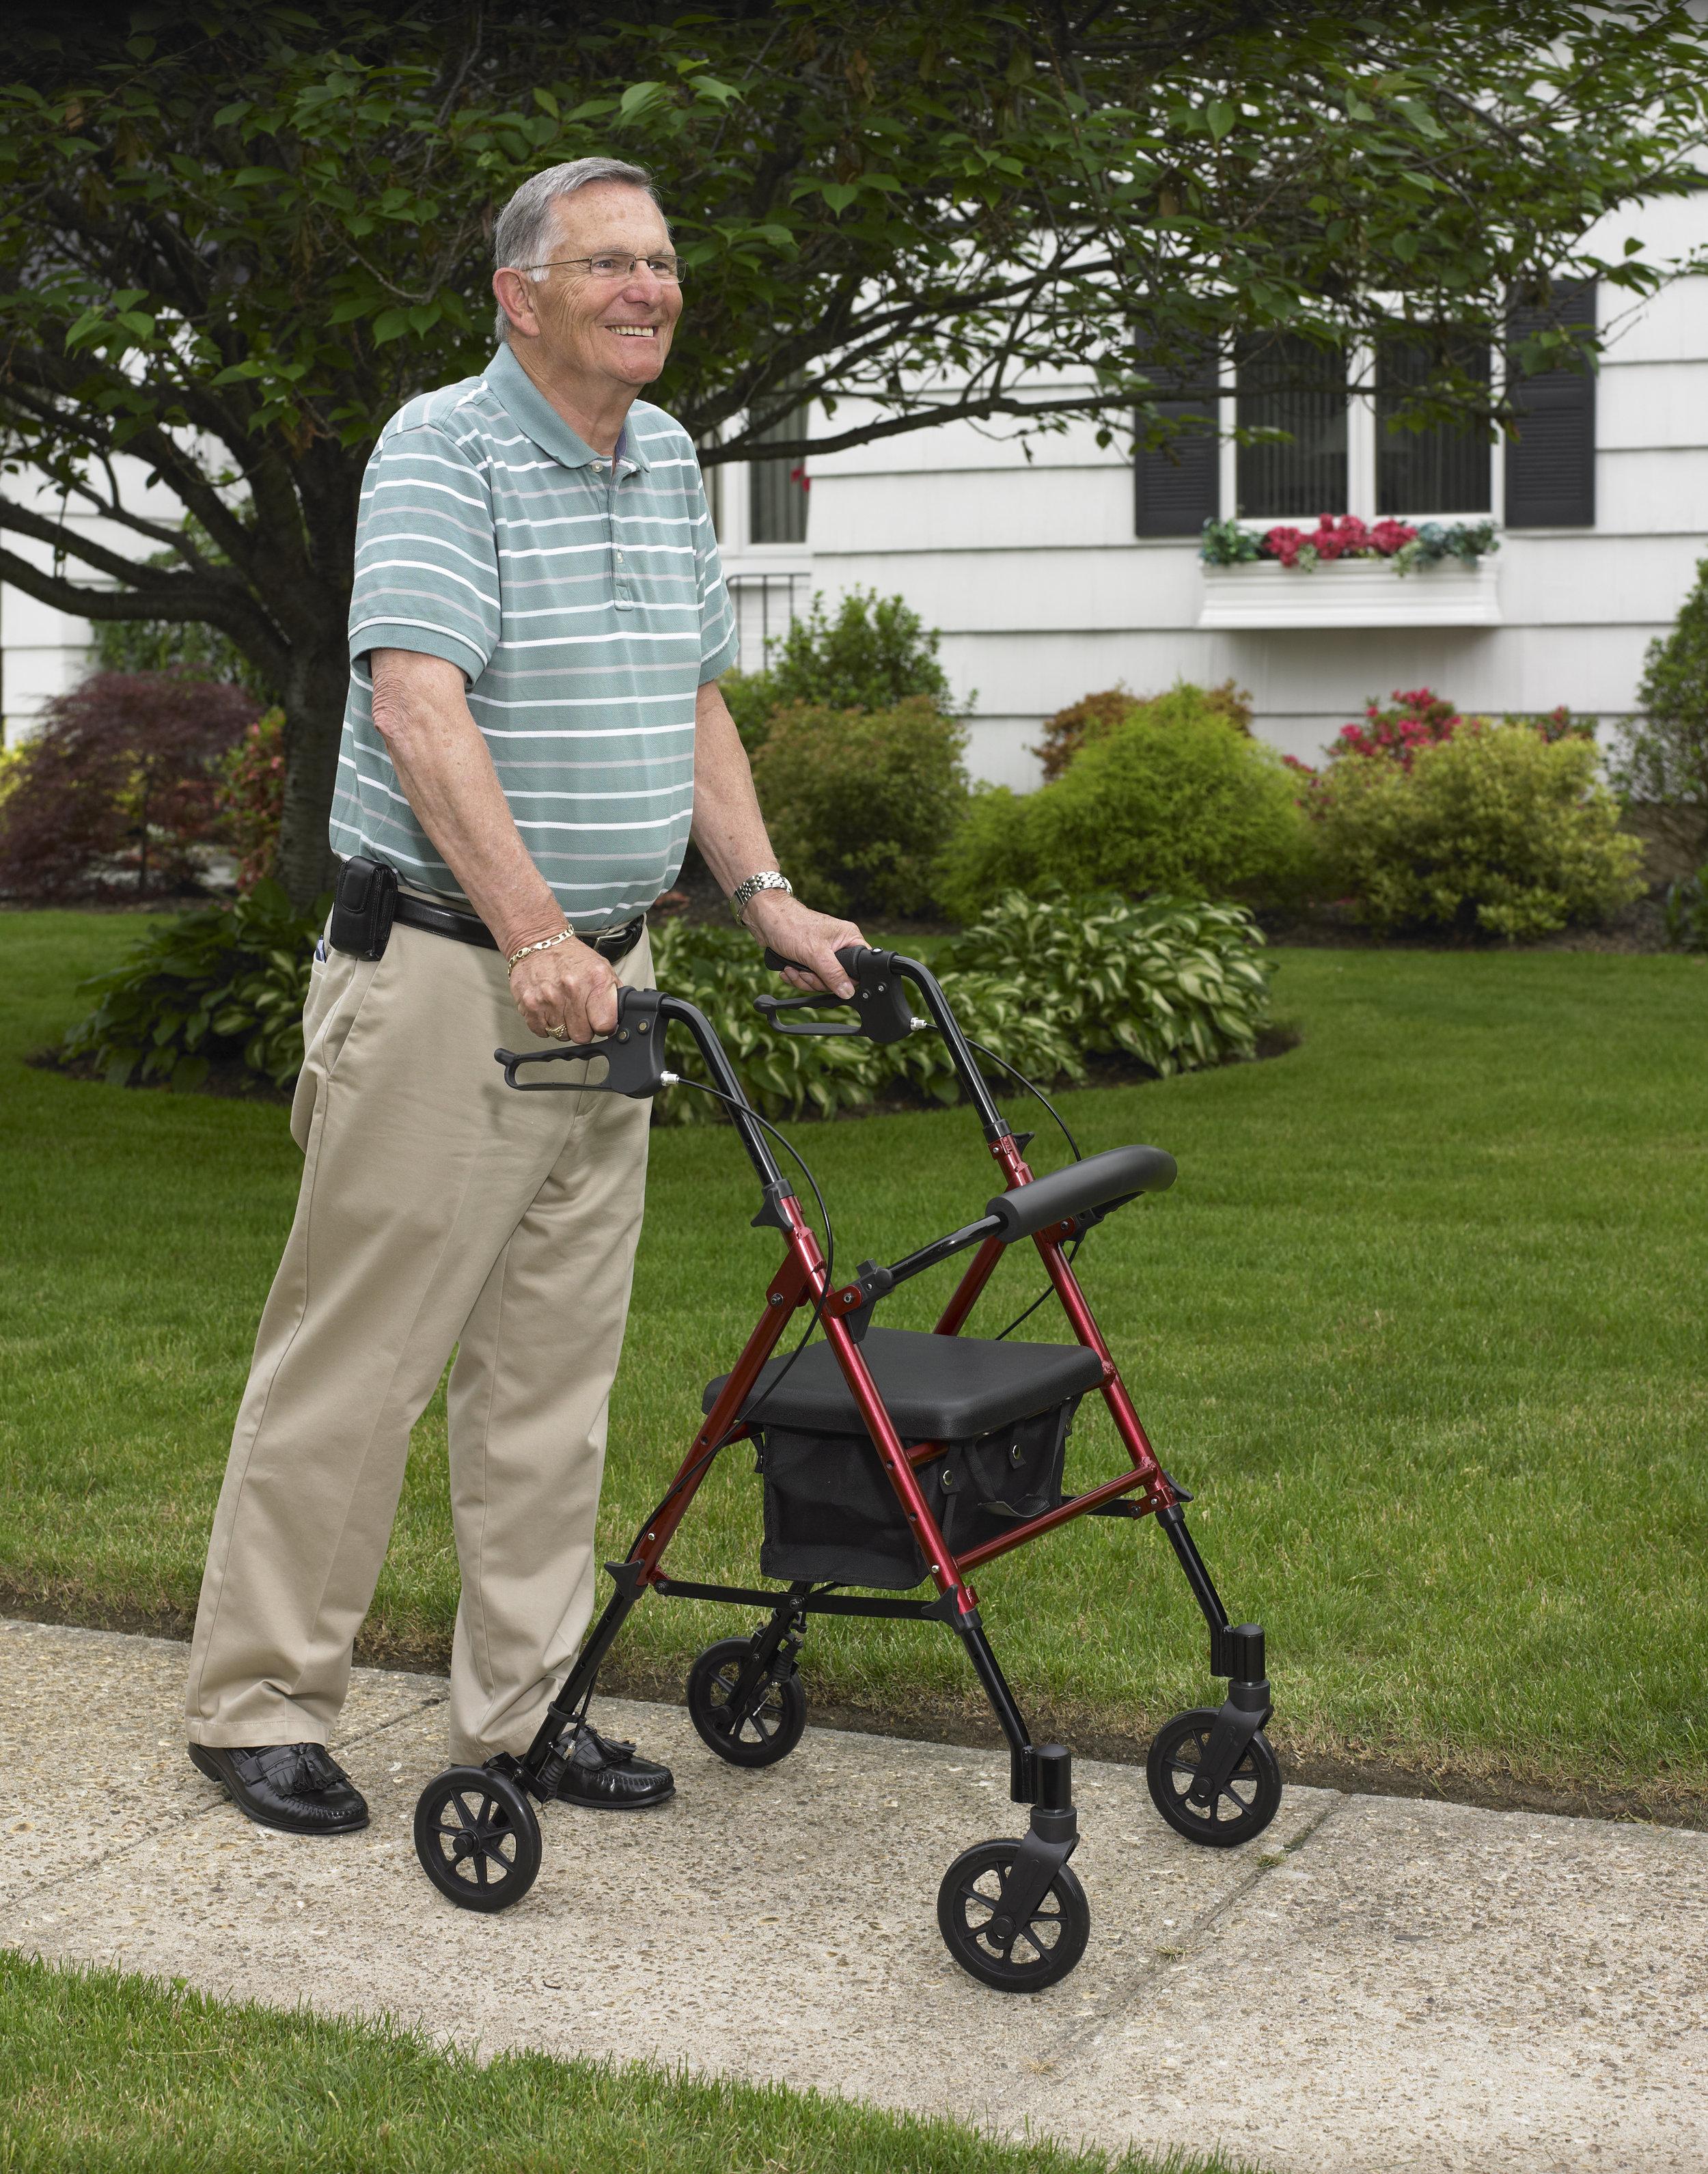 old-man-using-wheeled-walker-outdoors.jpg